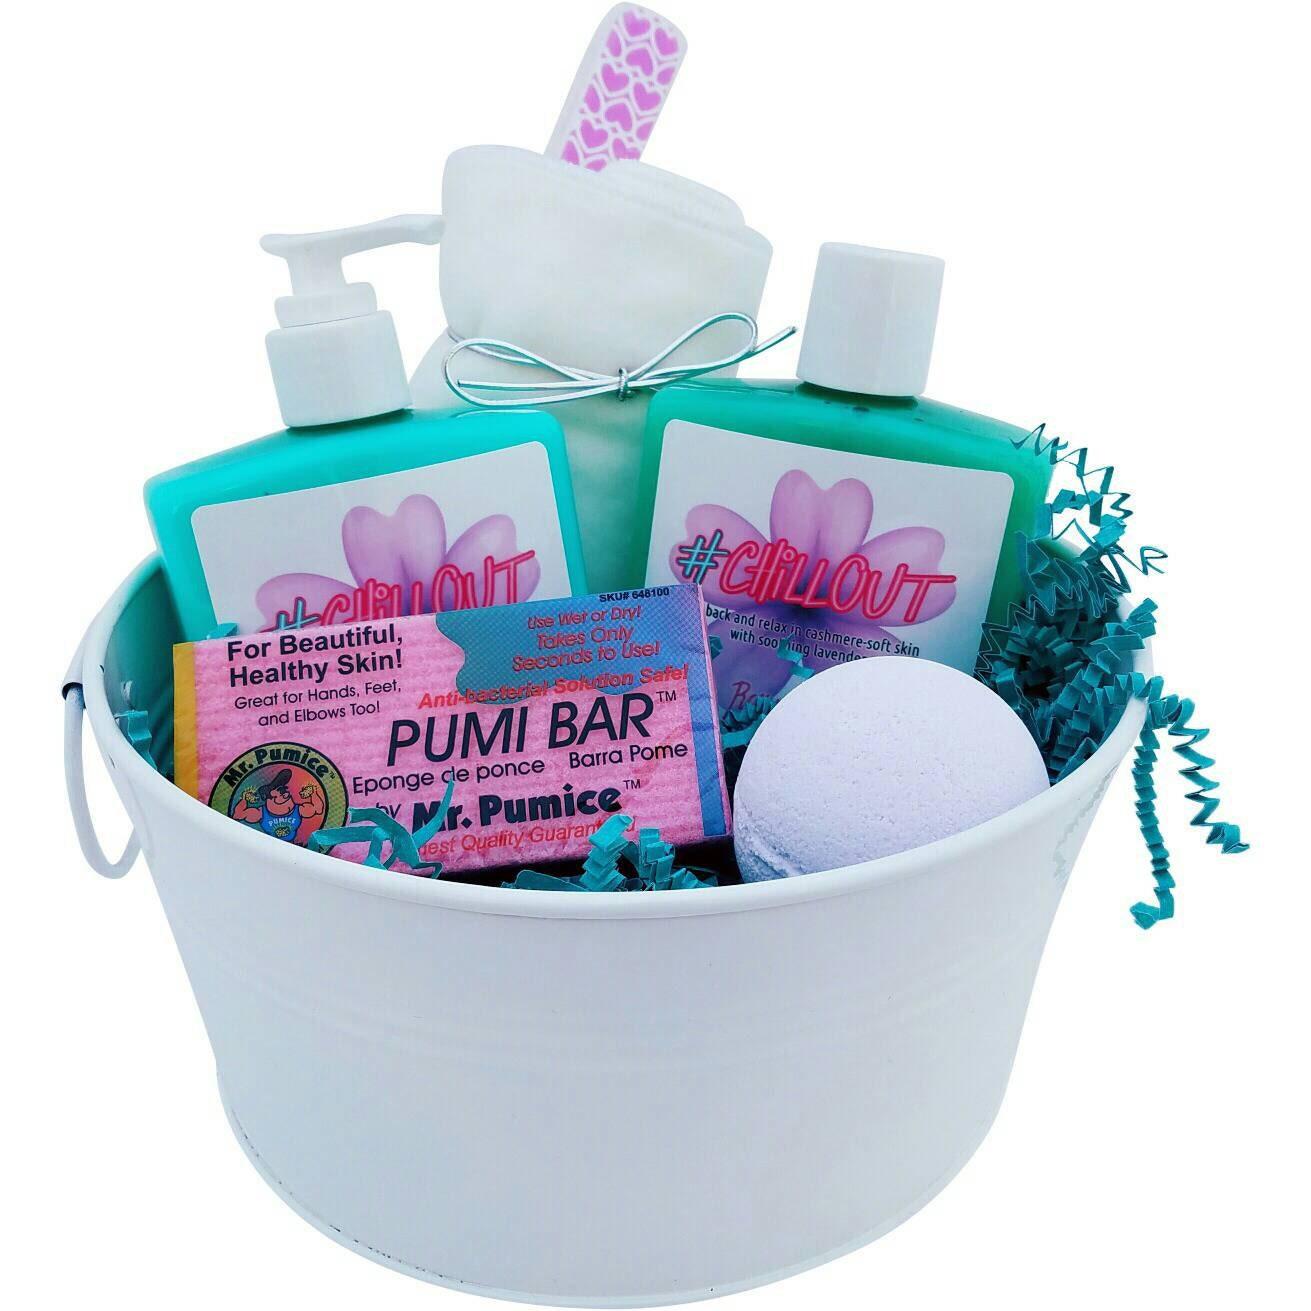 Bath and Body Gift SetMani Pedi GiftGift Baskets for | Etsy